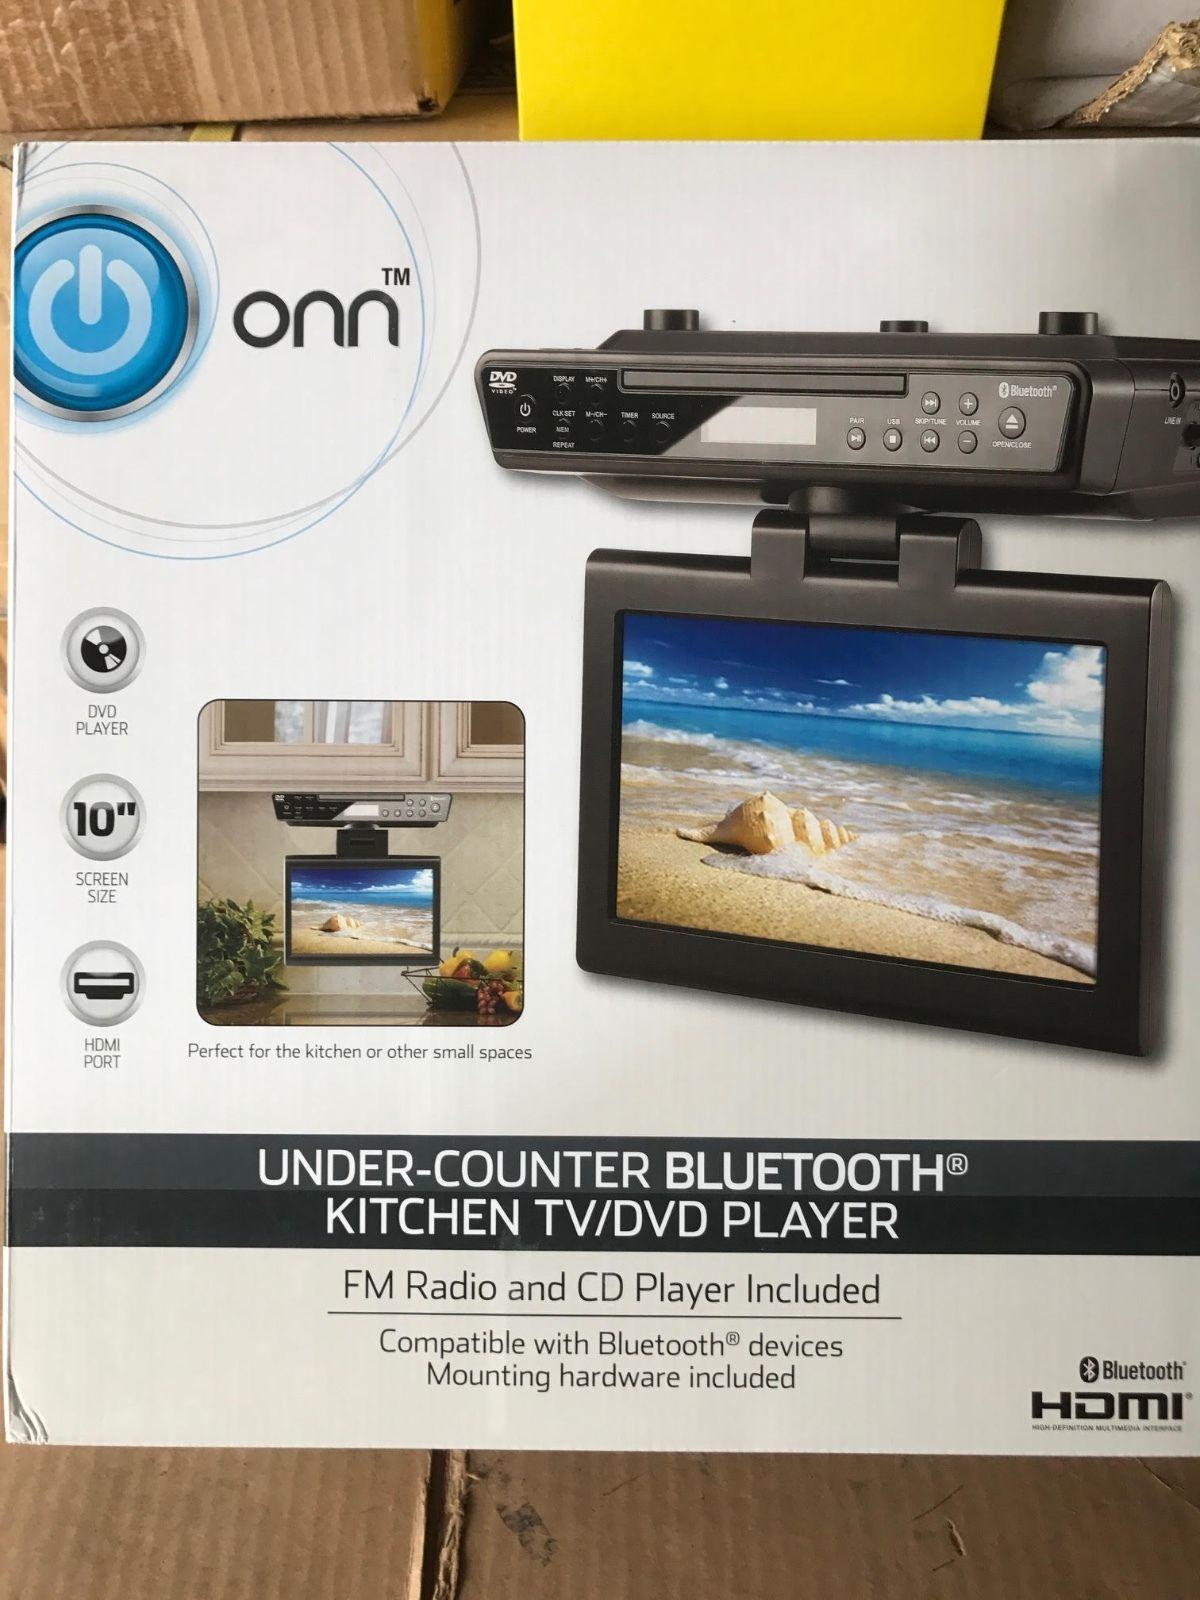 Kitchen Stereo Under Cabinet Dvd And Blu Ray Players Brand New Onn Ona16av011 Under Kitchen